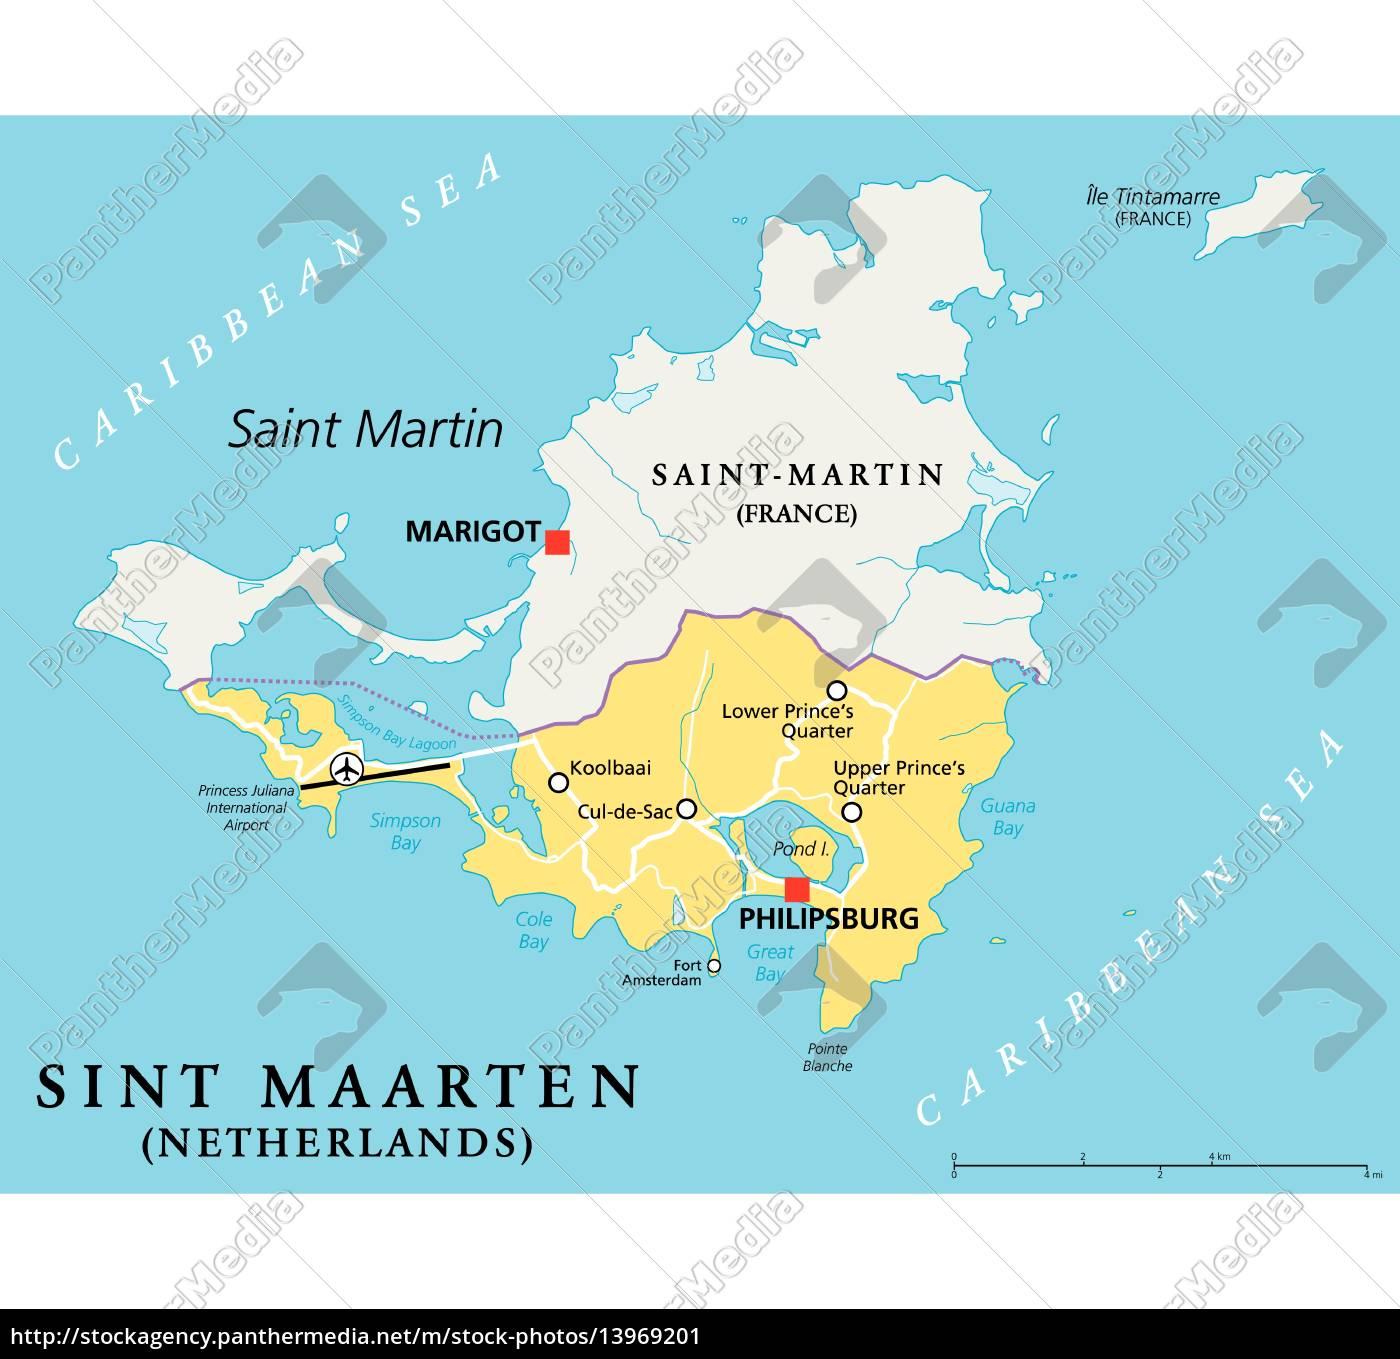 royalty free vector 13969201 - Sint Maarten Political Map on aruba map, st. maarten road map, anguilla map, portugal map, guana bay map, bahamas map, st. maarten cruise port map, barbados map, satawal island map, virgin islands map, st. maarten resort map, simpson bay map, caribbean map, st maarten water taxi map, charlotte amalie map, cayman islands map, saint eustatius map, bvi map, canada map, saint lucia location map,